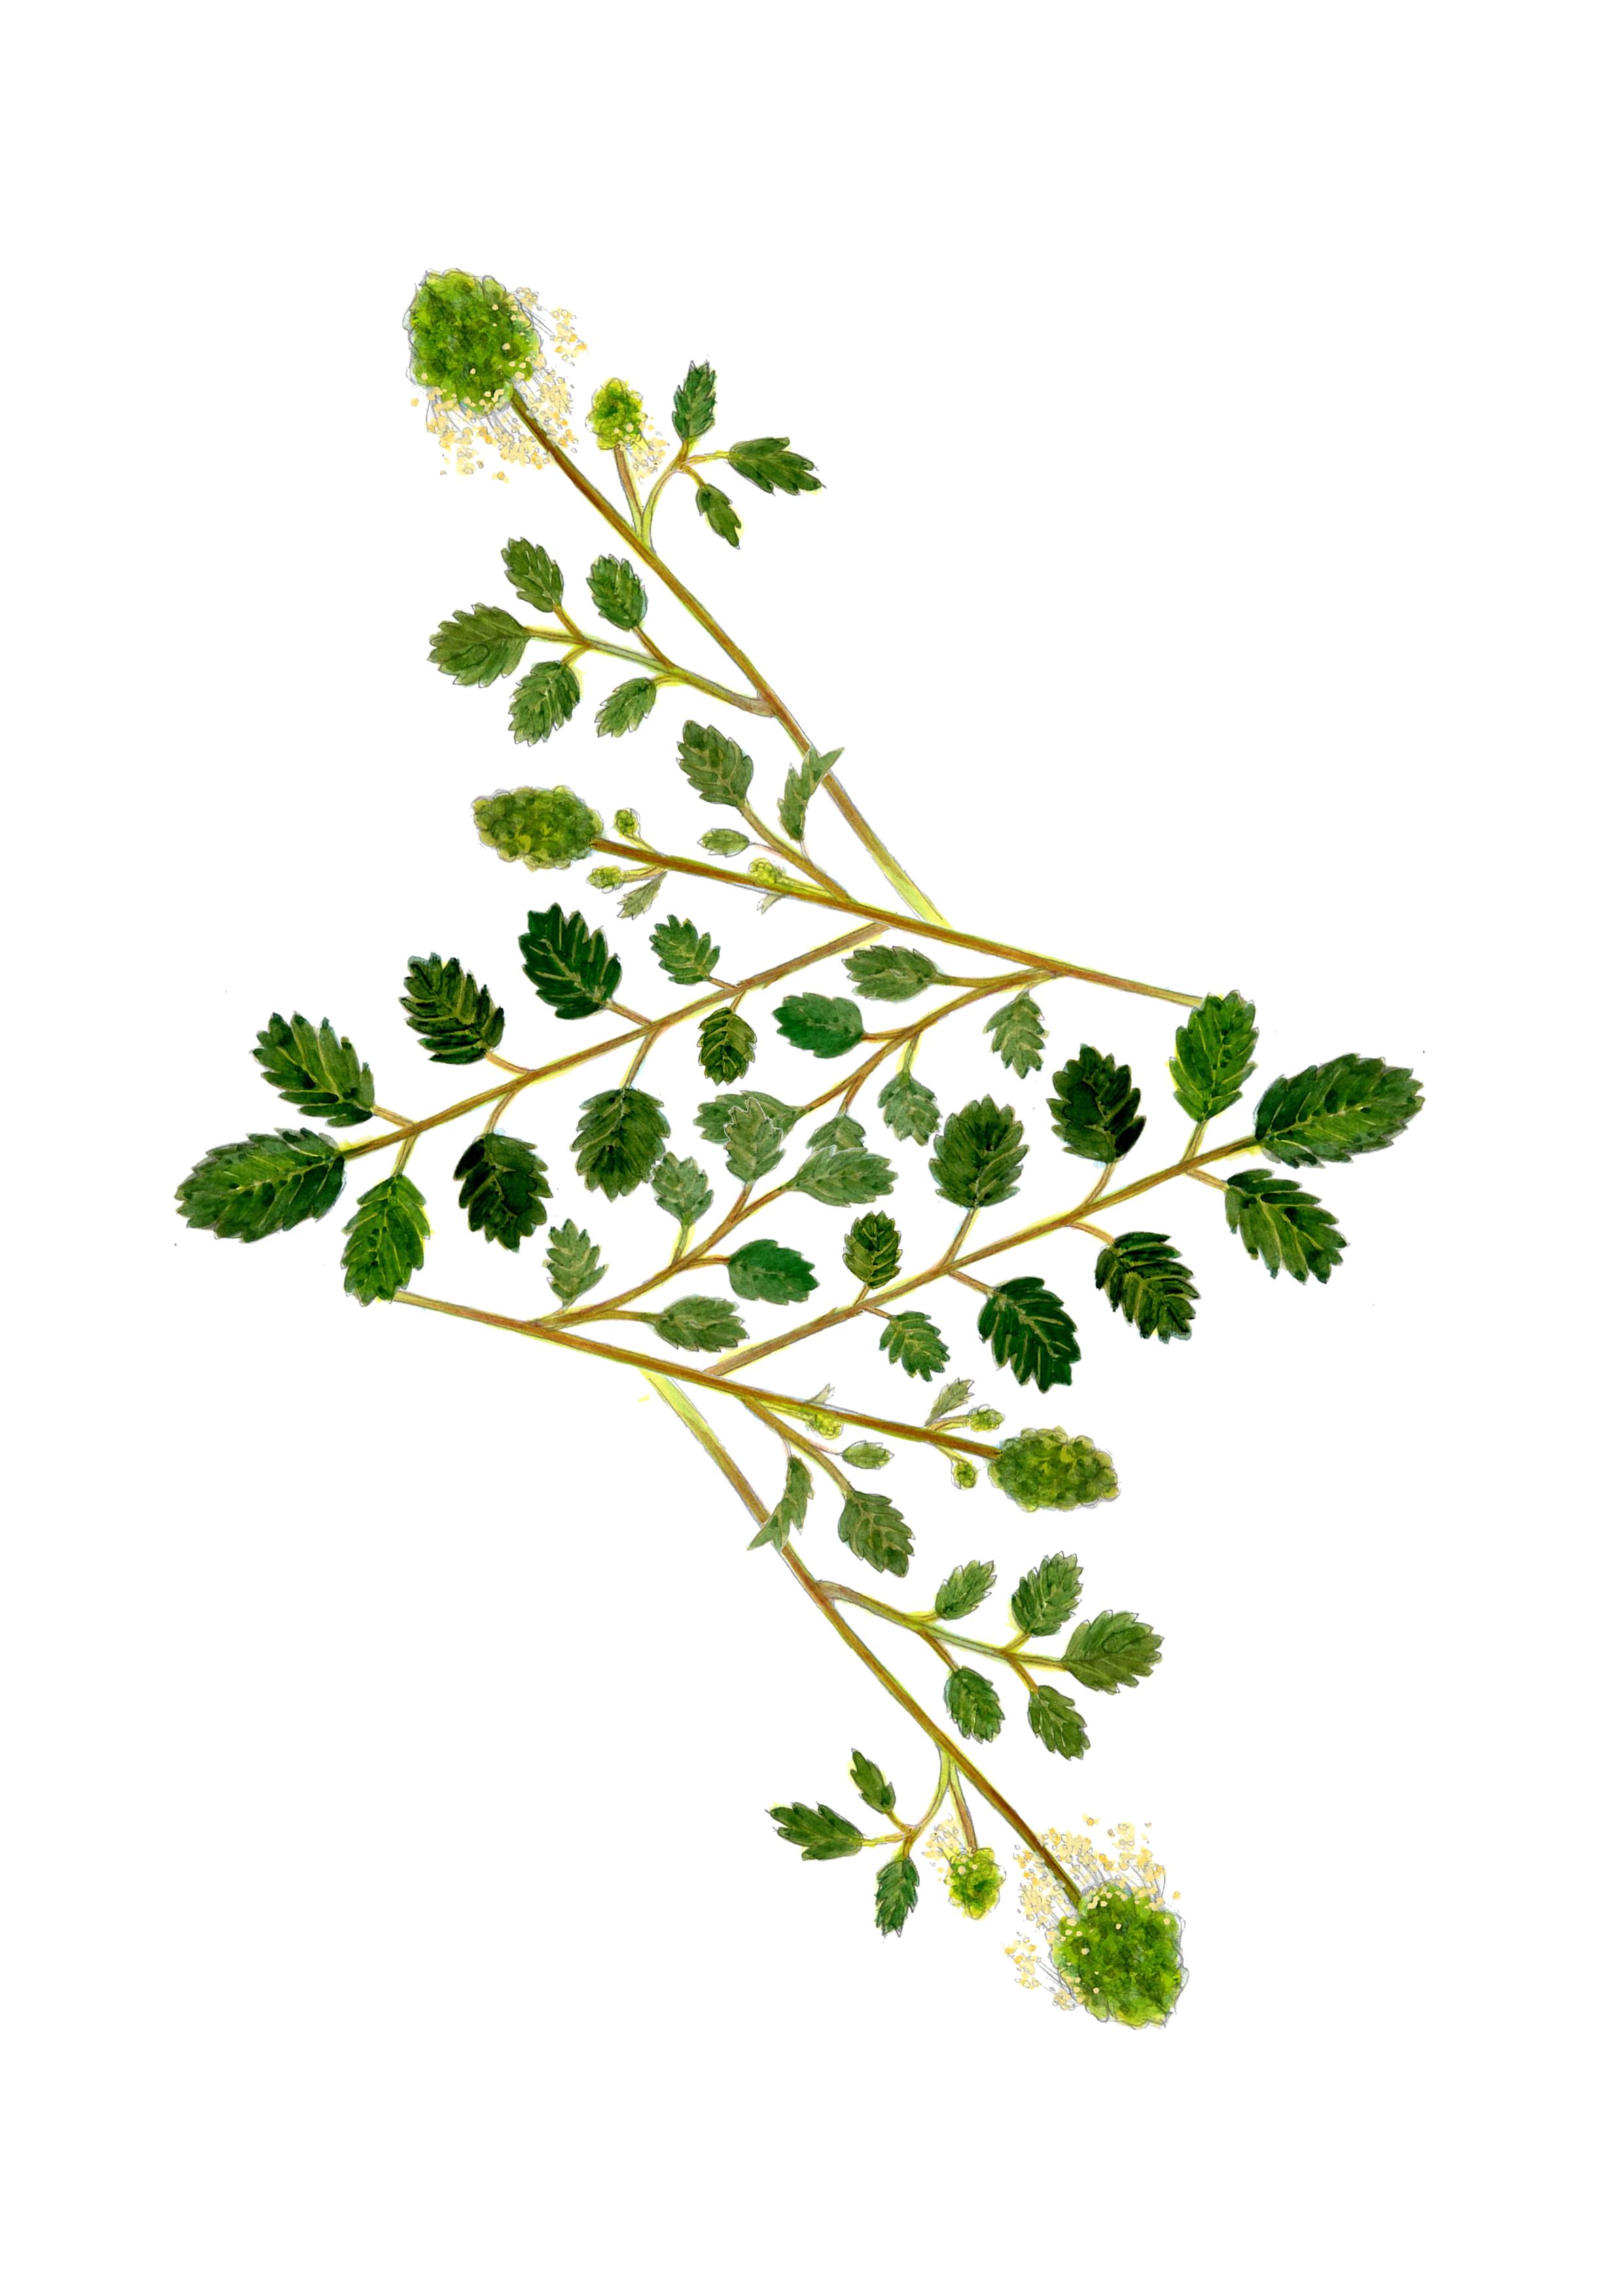 plants28